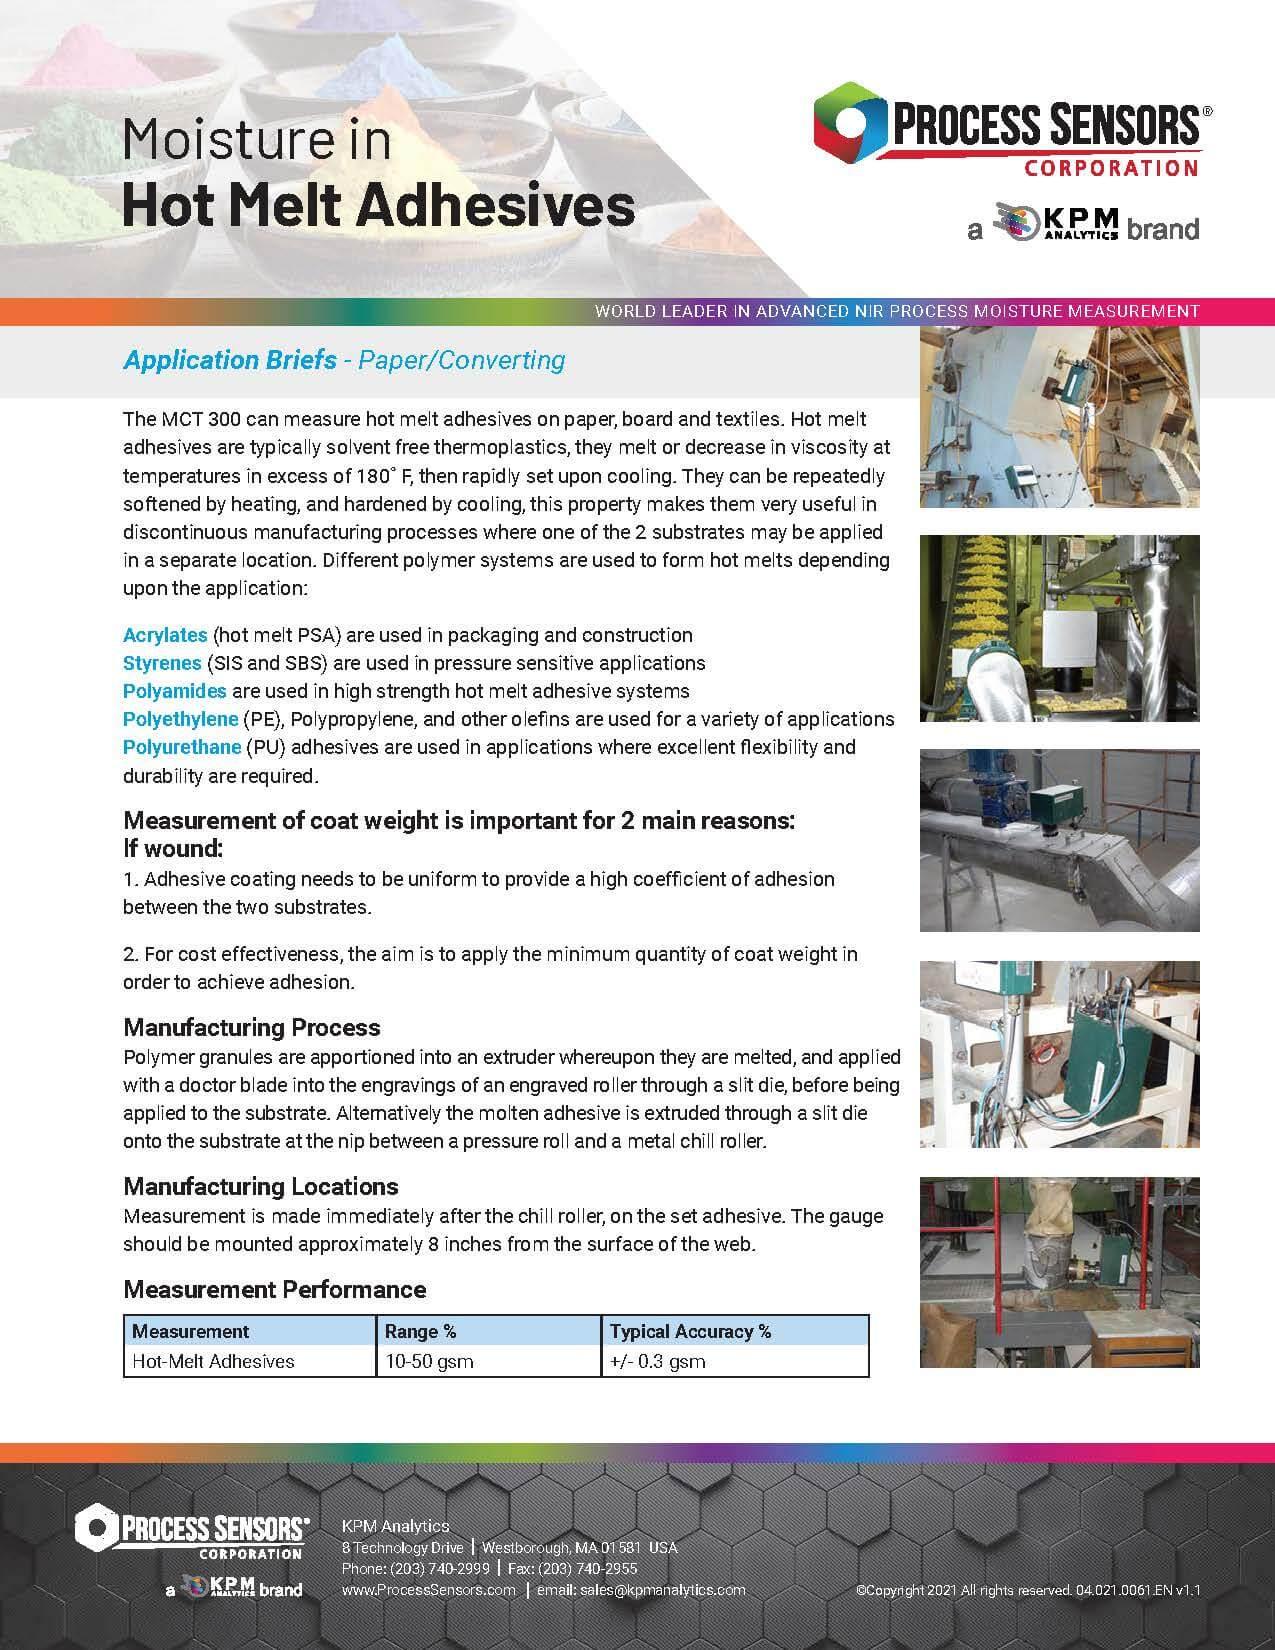 Moisture in Hot Melt Adhesives